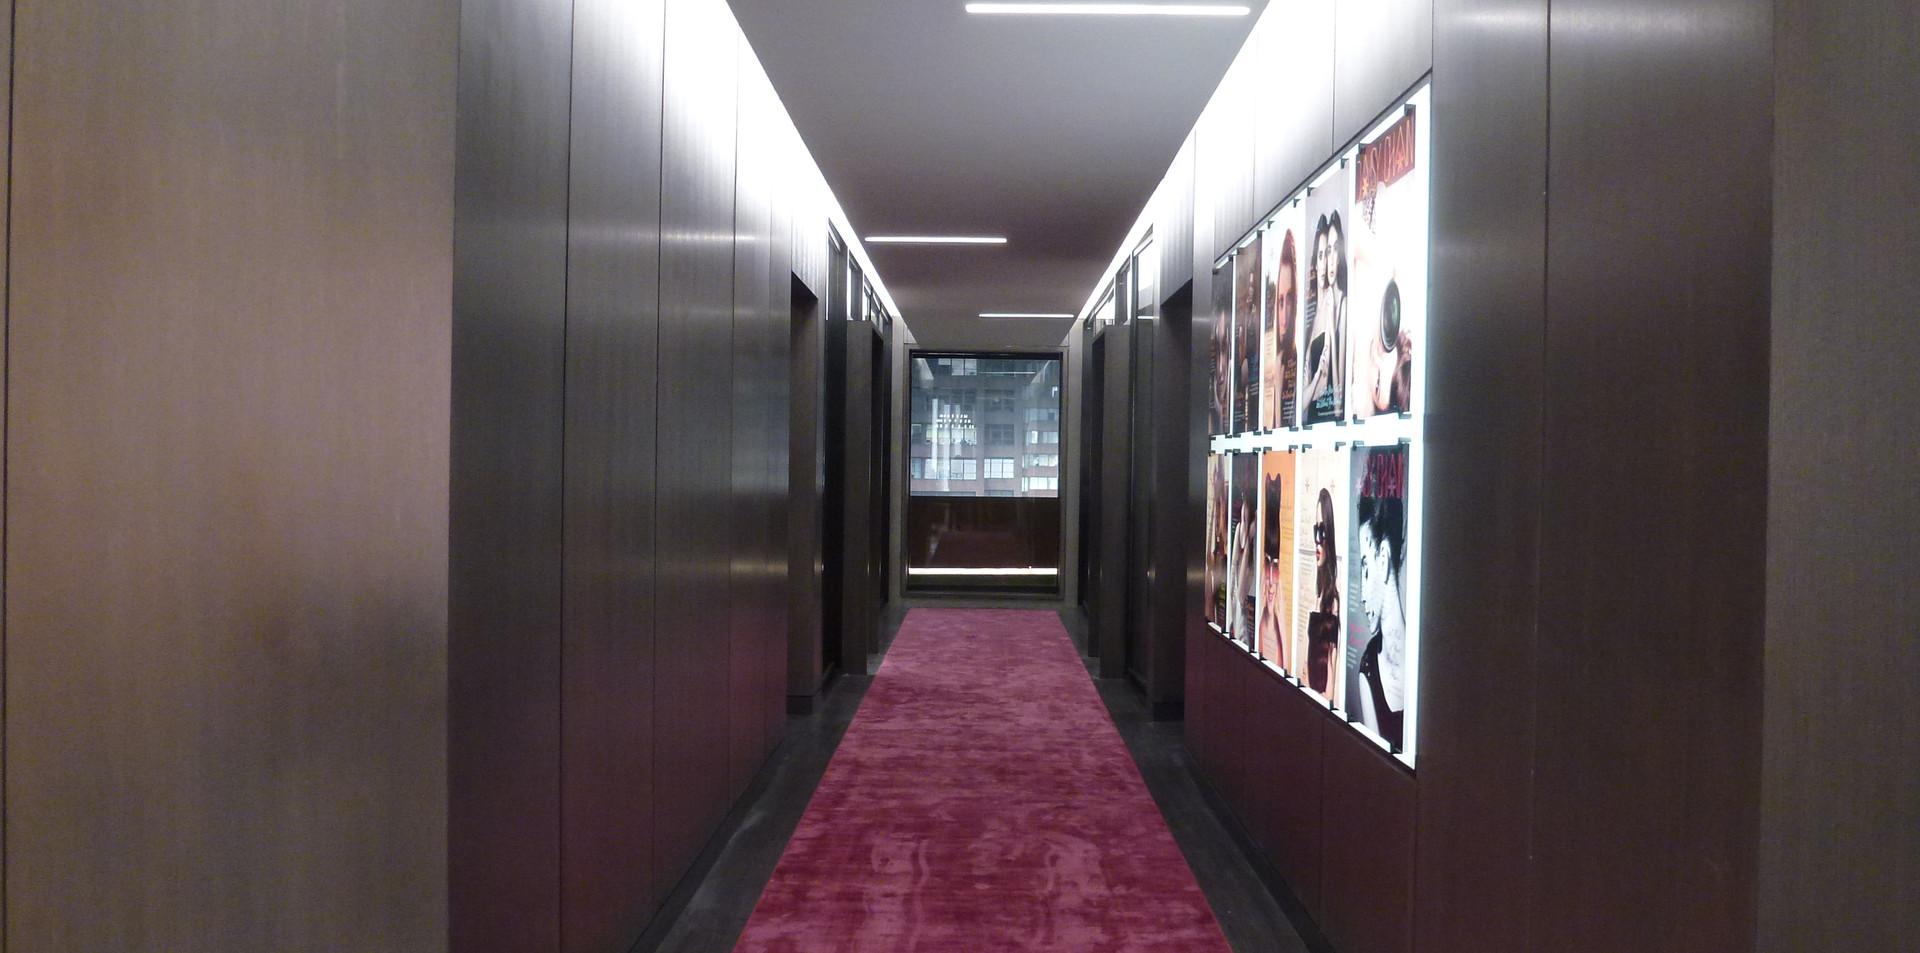 Hallway of Magazine Office